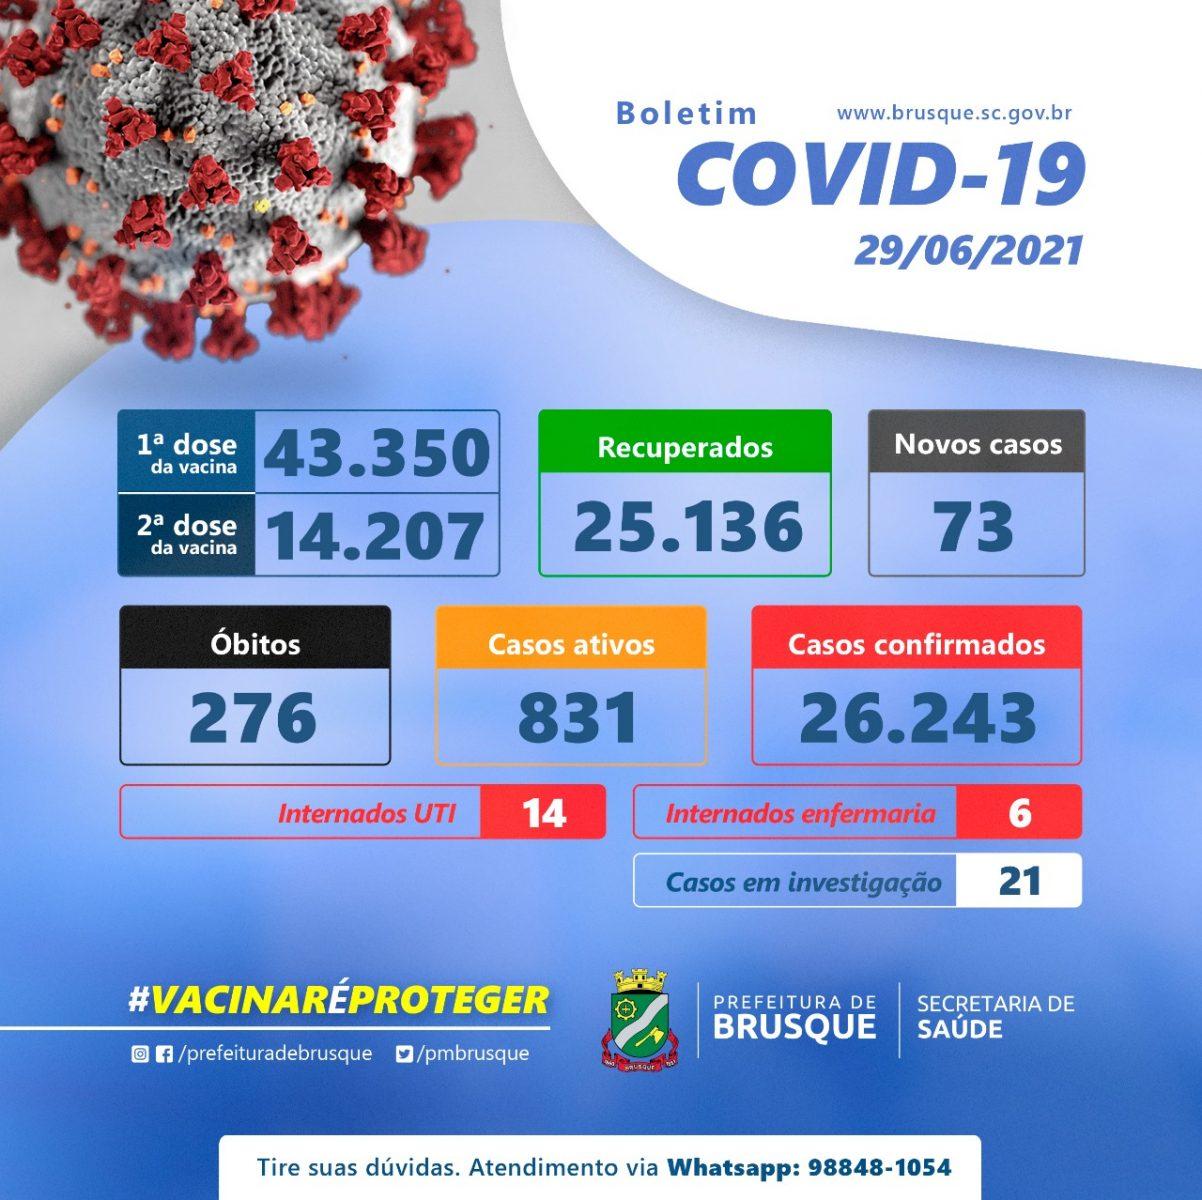 Covid-19: Confira o boletim epidemiológico desta terça-feira (29)